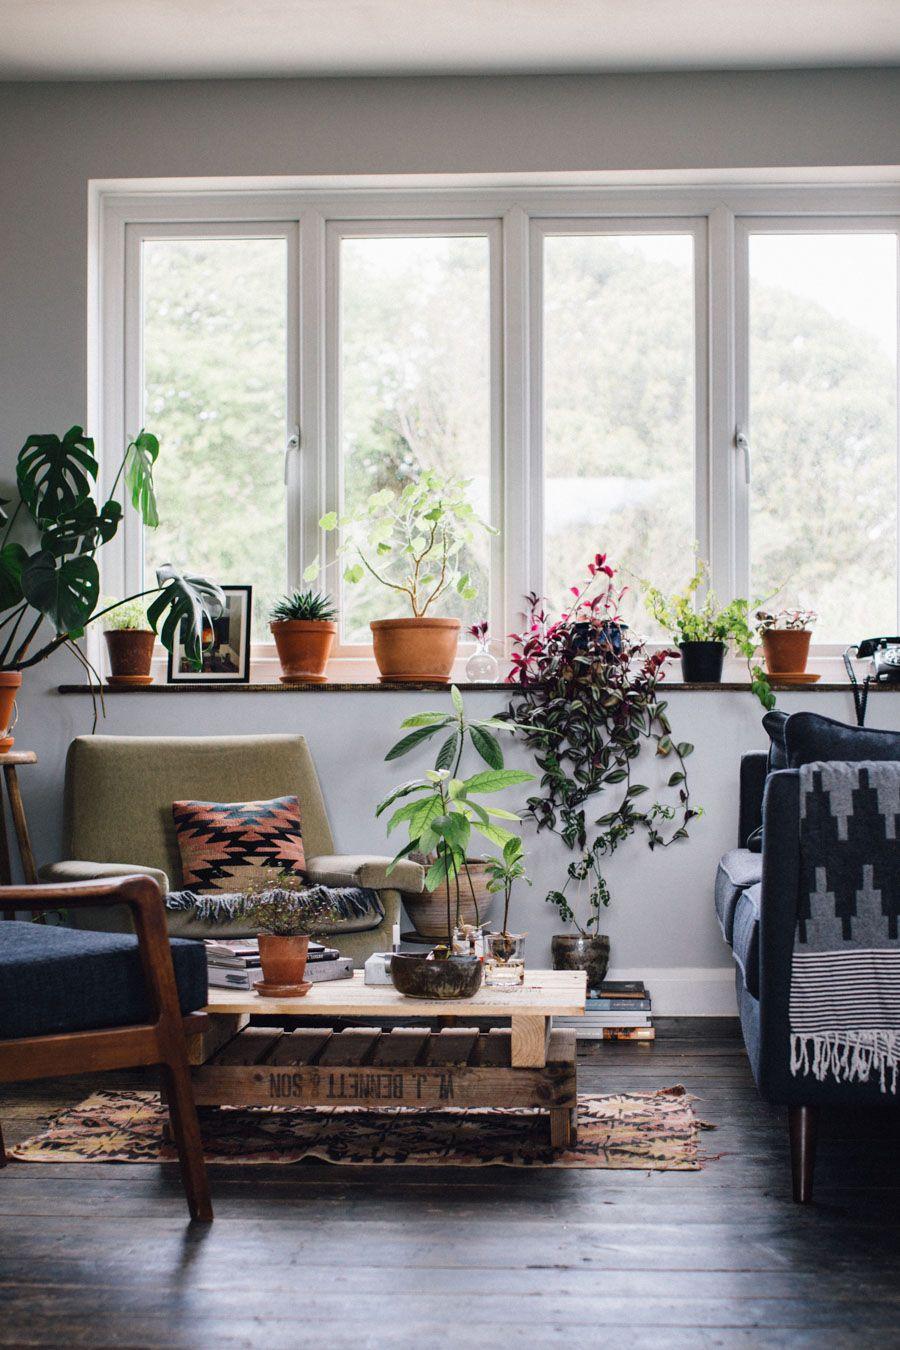 Living Room Interior Design Pdf: Modern Rustic Bohemian Plant Filled Living Space